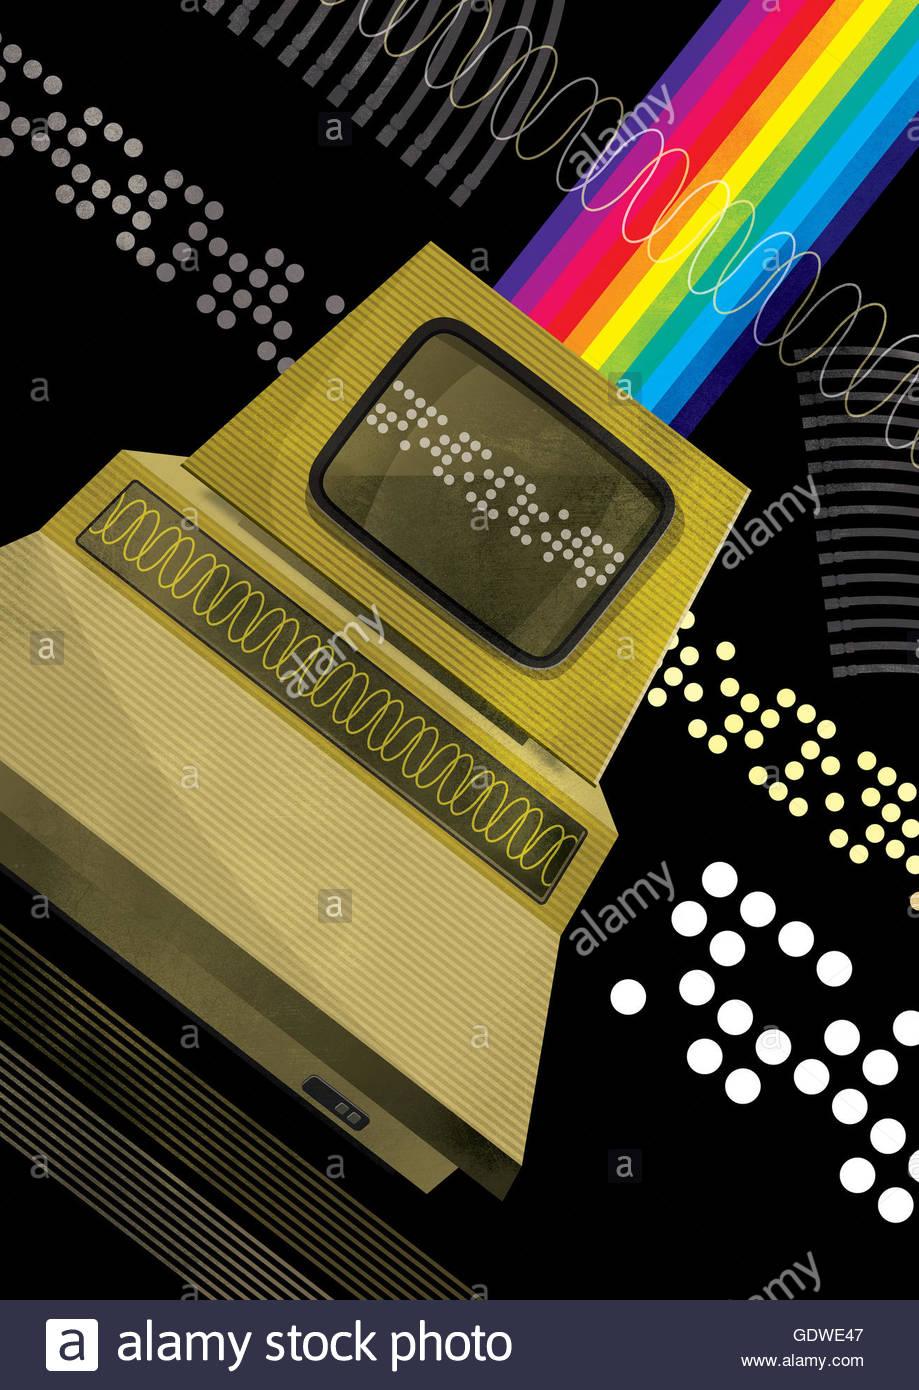 Retro personal computer with rainbow Stock Photo